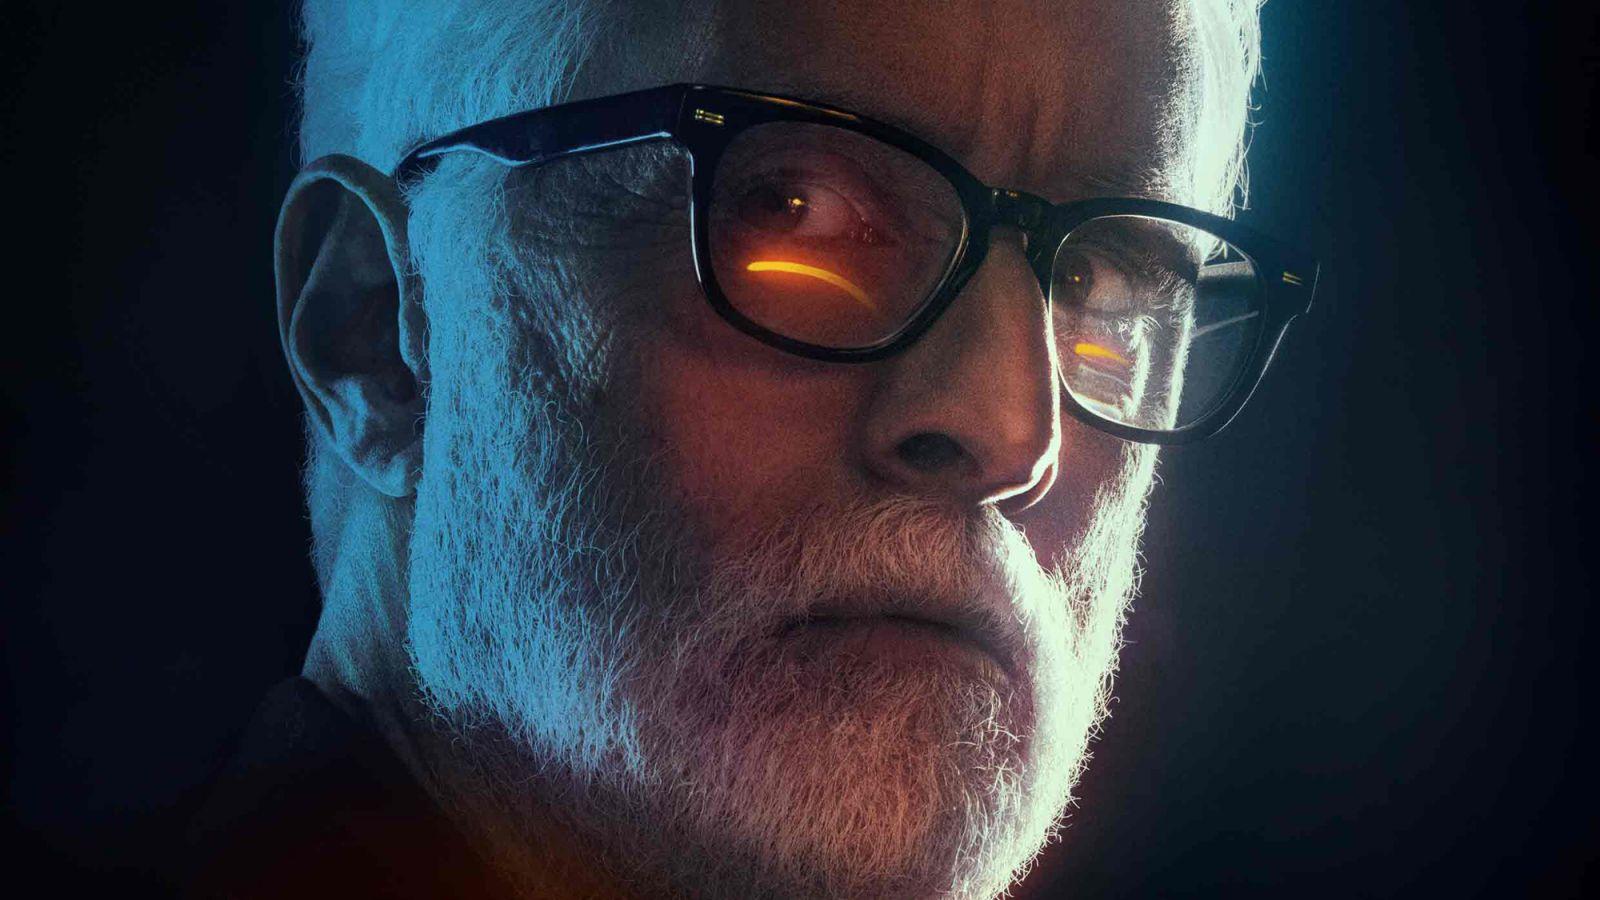 «NEXT»: Συνωμοσίες και τεχνητή νοημοσύνη – Η νέα σειρά με τον John Slattery έρχεται στο Fox [pics & vid]